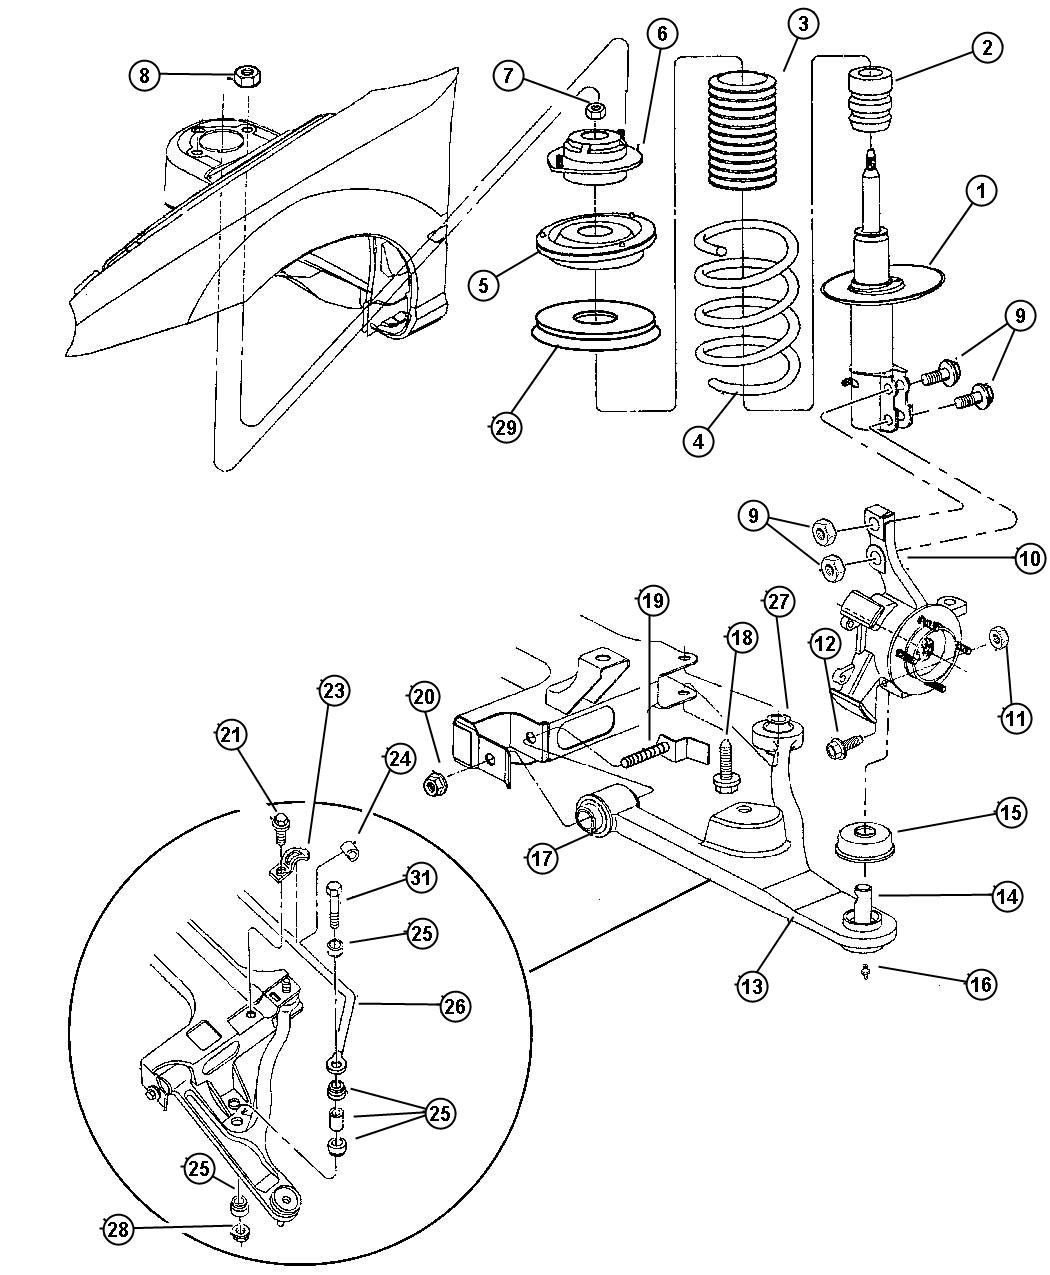 1997 dodge neon front engine fuse box diagram